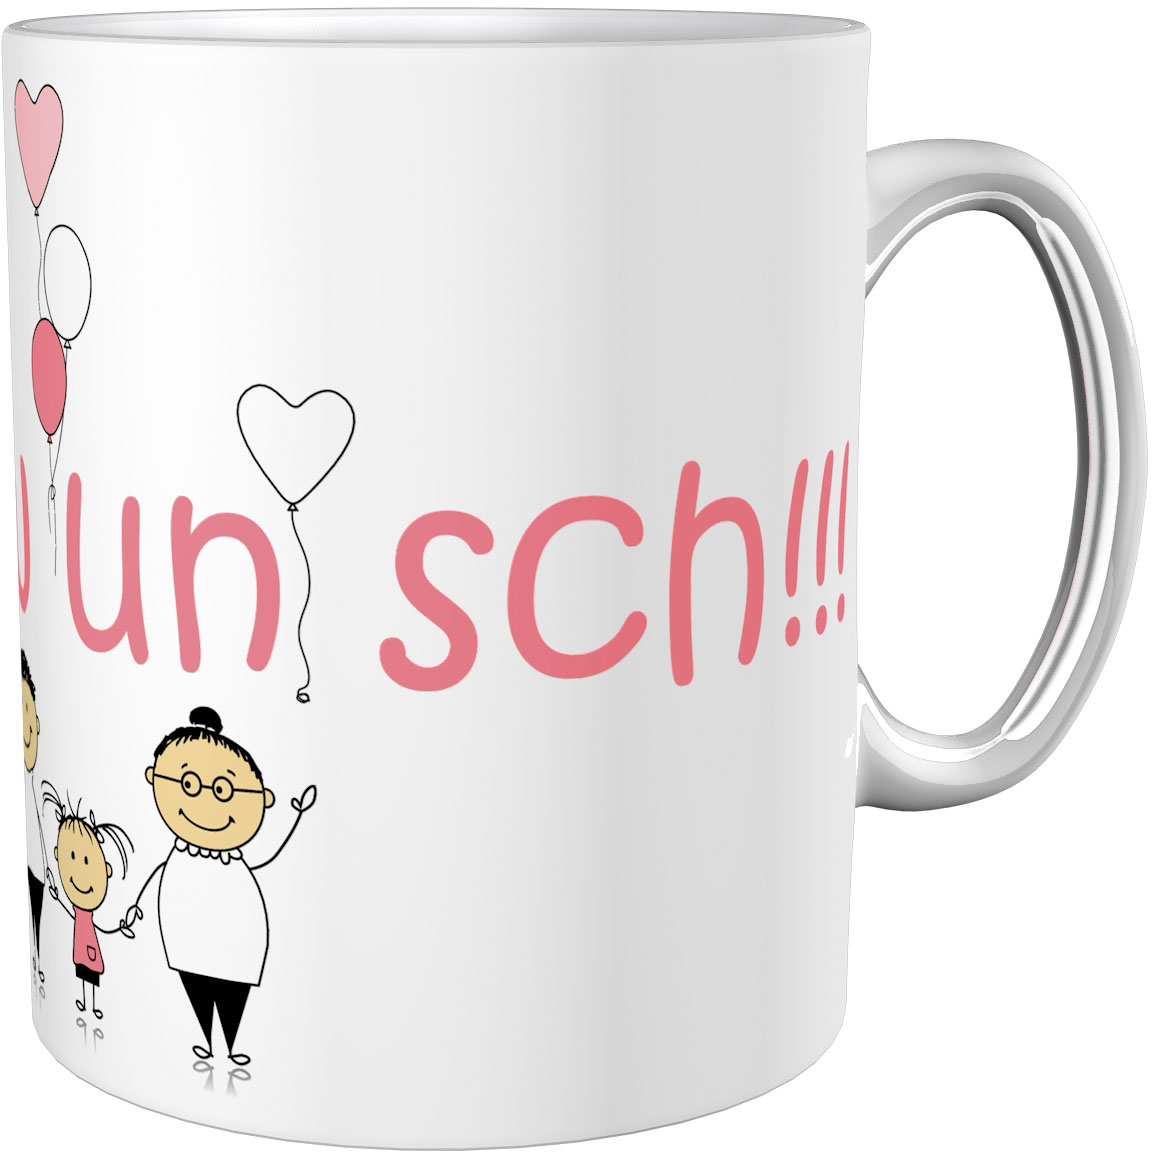 Kaffeetasse / Kaffeebecher / Fröhliche Karrikatur / Geschenktasse